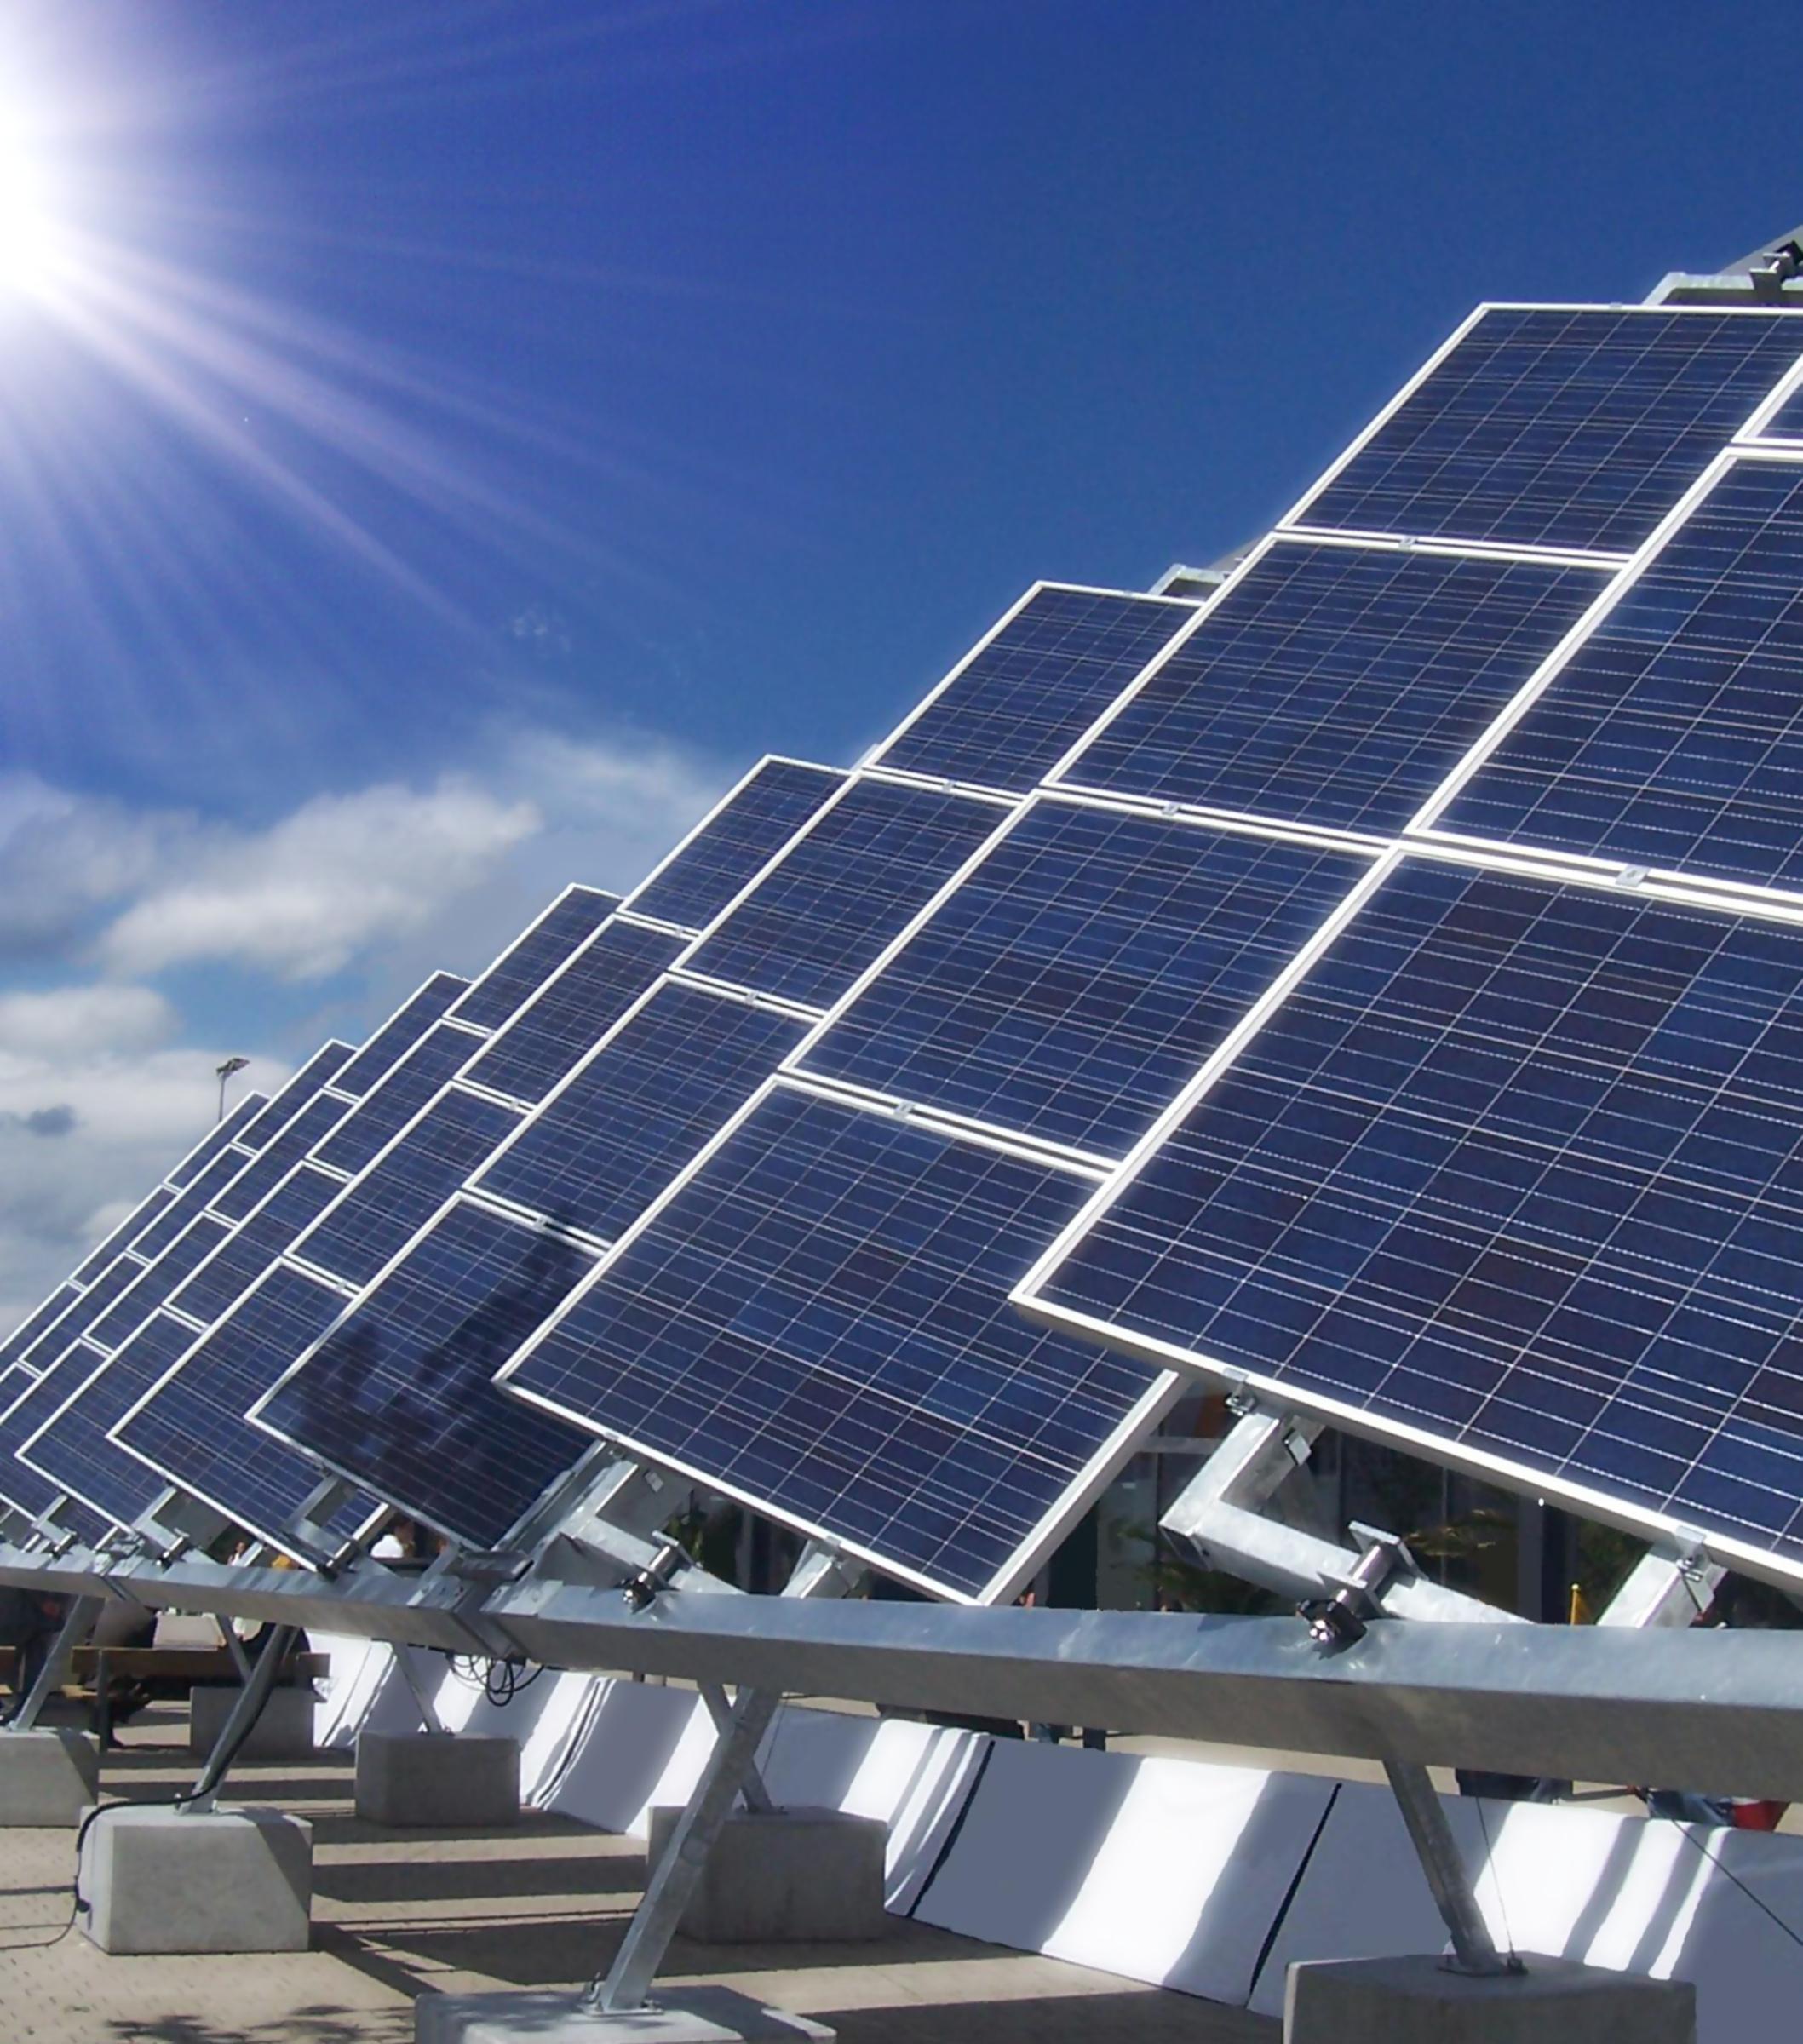 Impianti Fotovoltaici Per Risparmiare : Cavi elettrici per impianti fotovoltaici pubblicata la